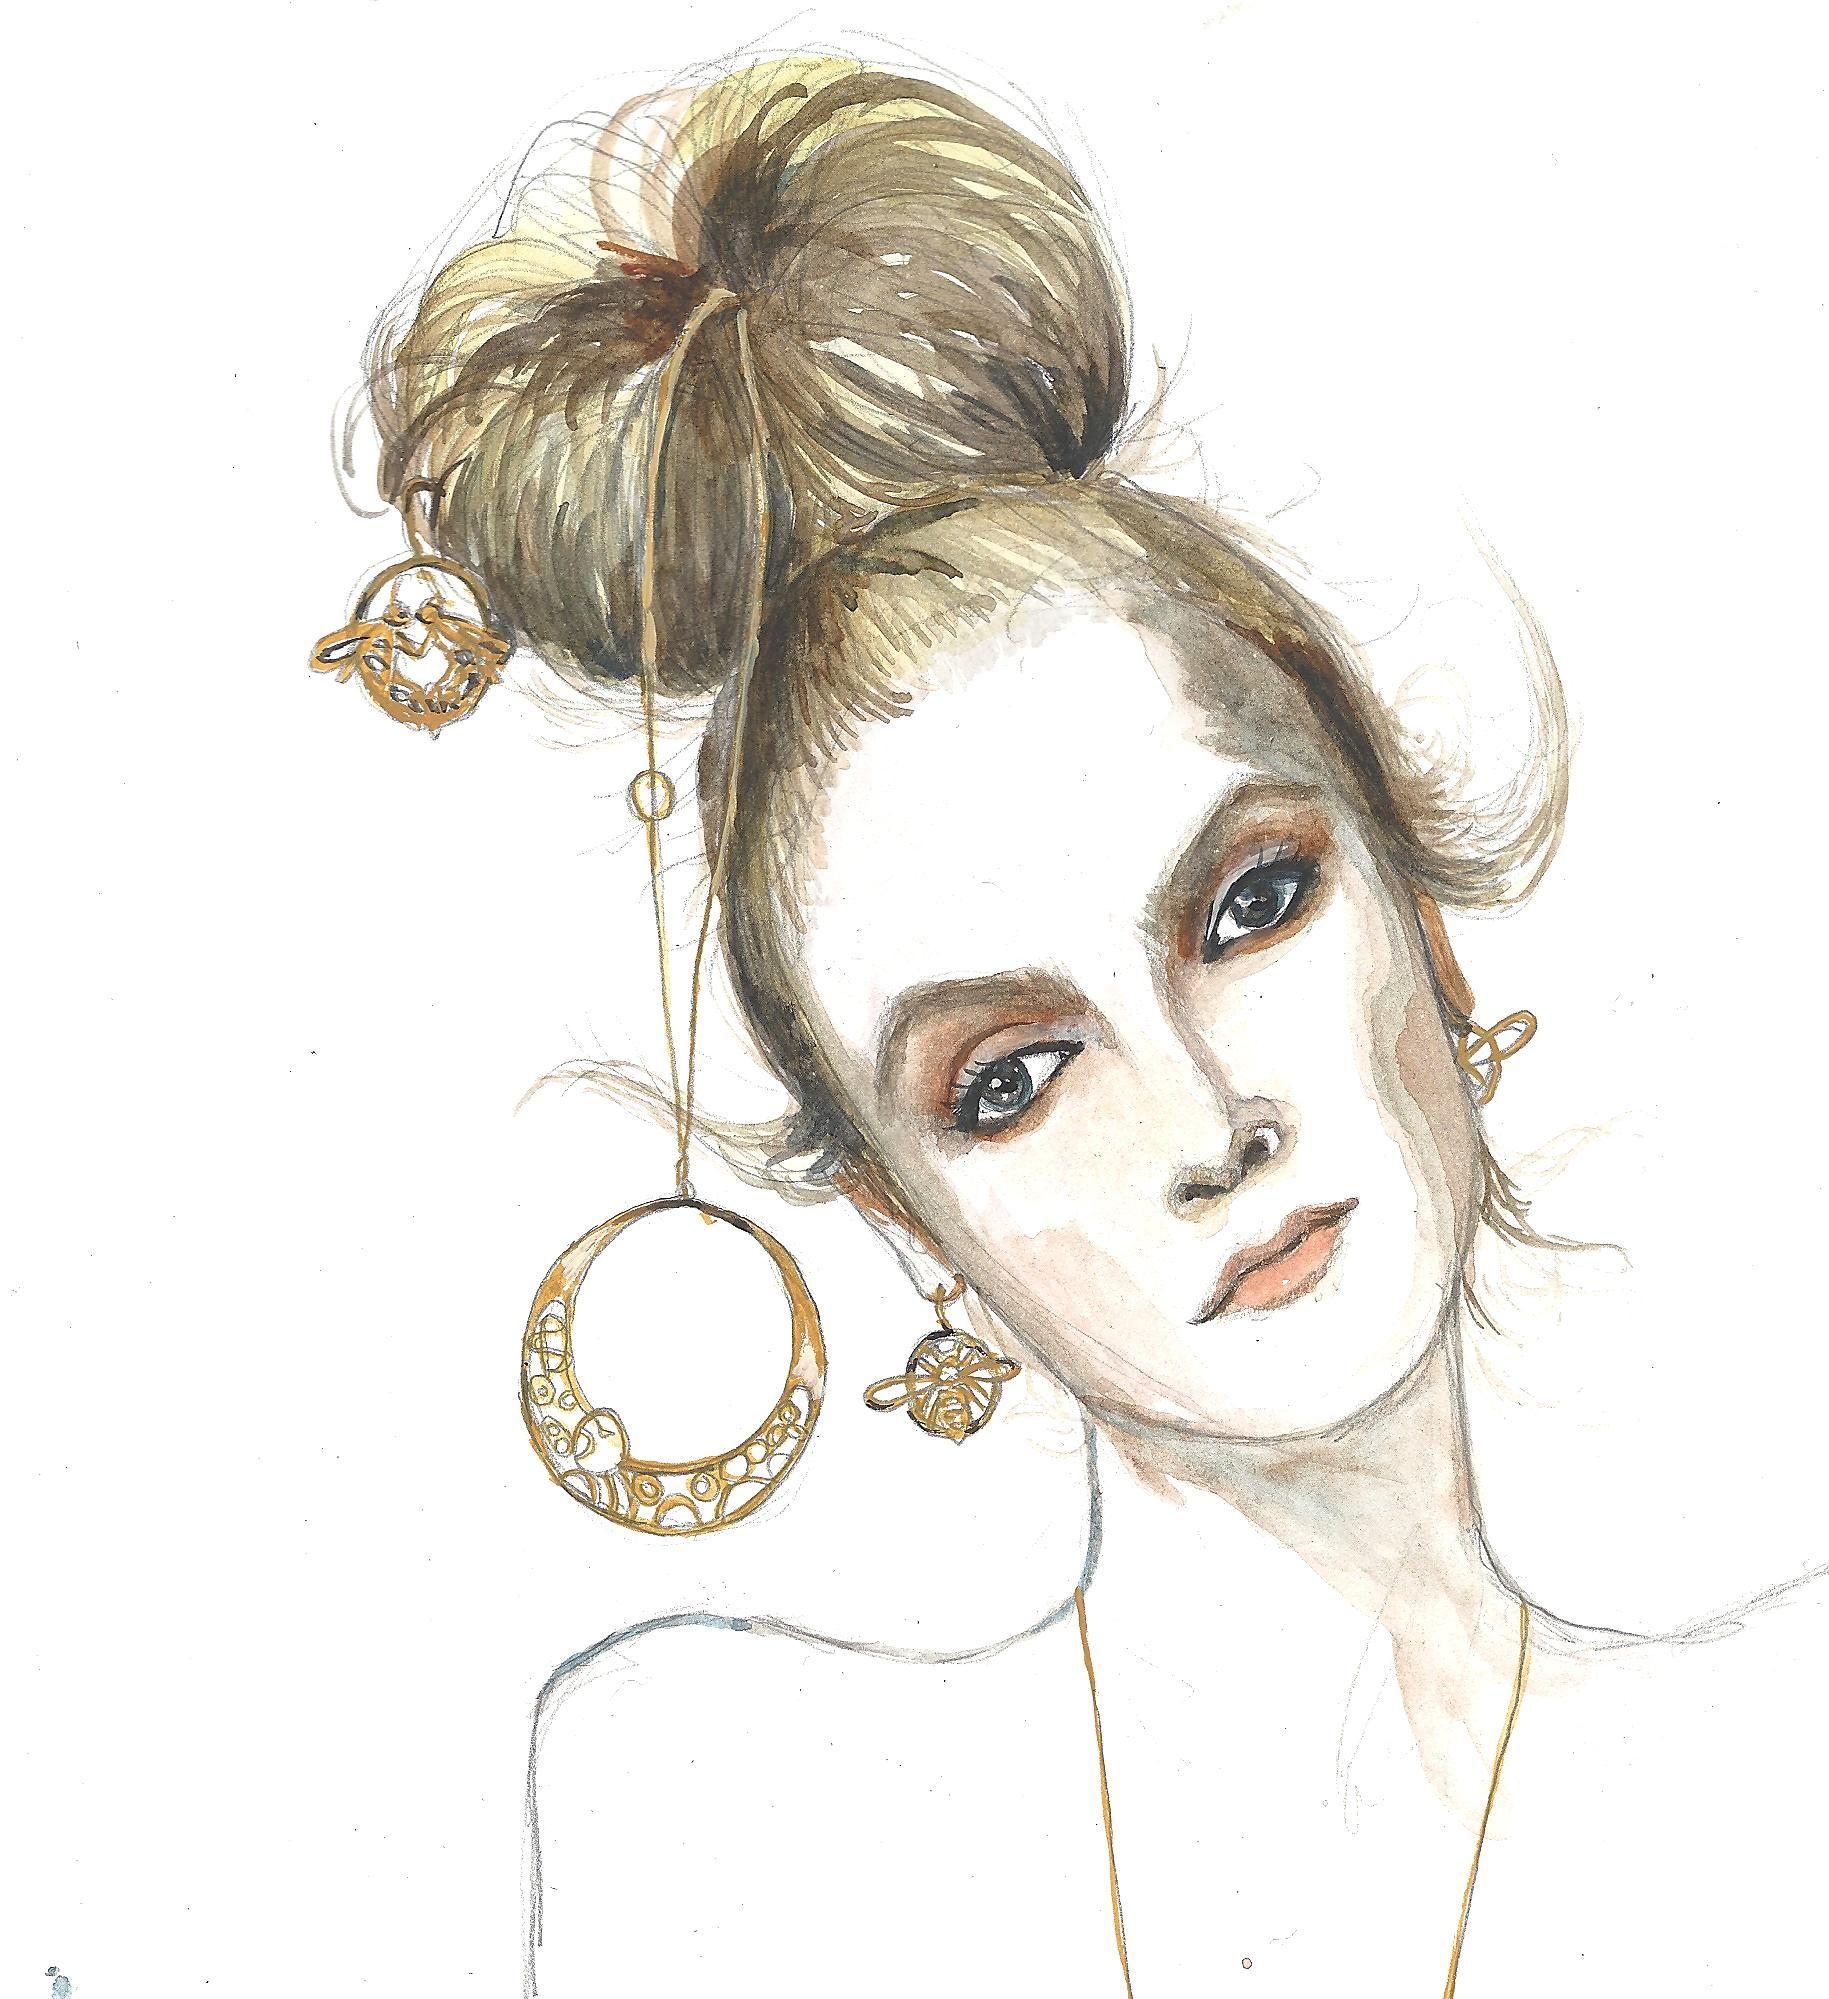 #Oria jewellery for @Amelia Gregory 's Amelia's Magazine